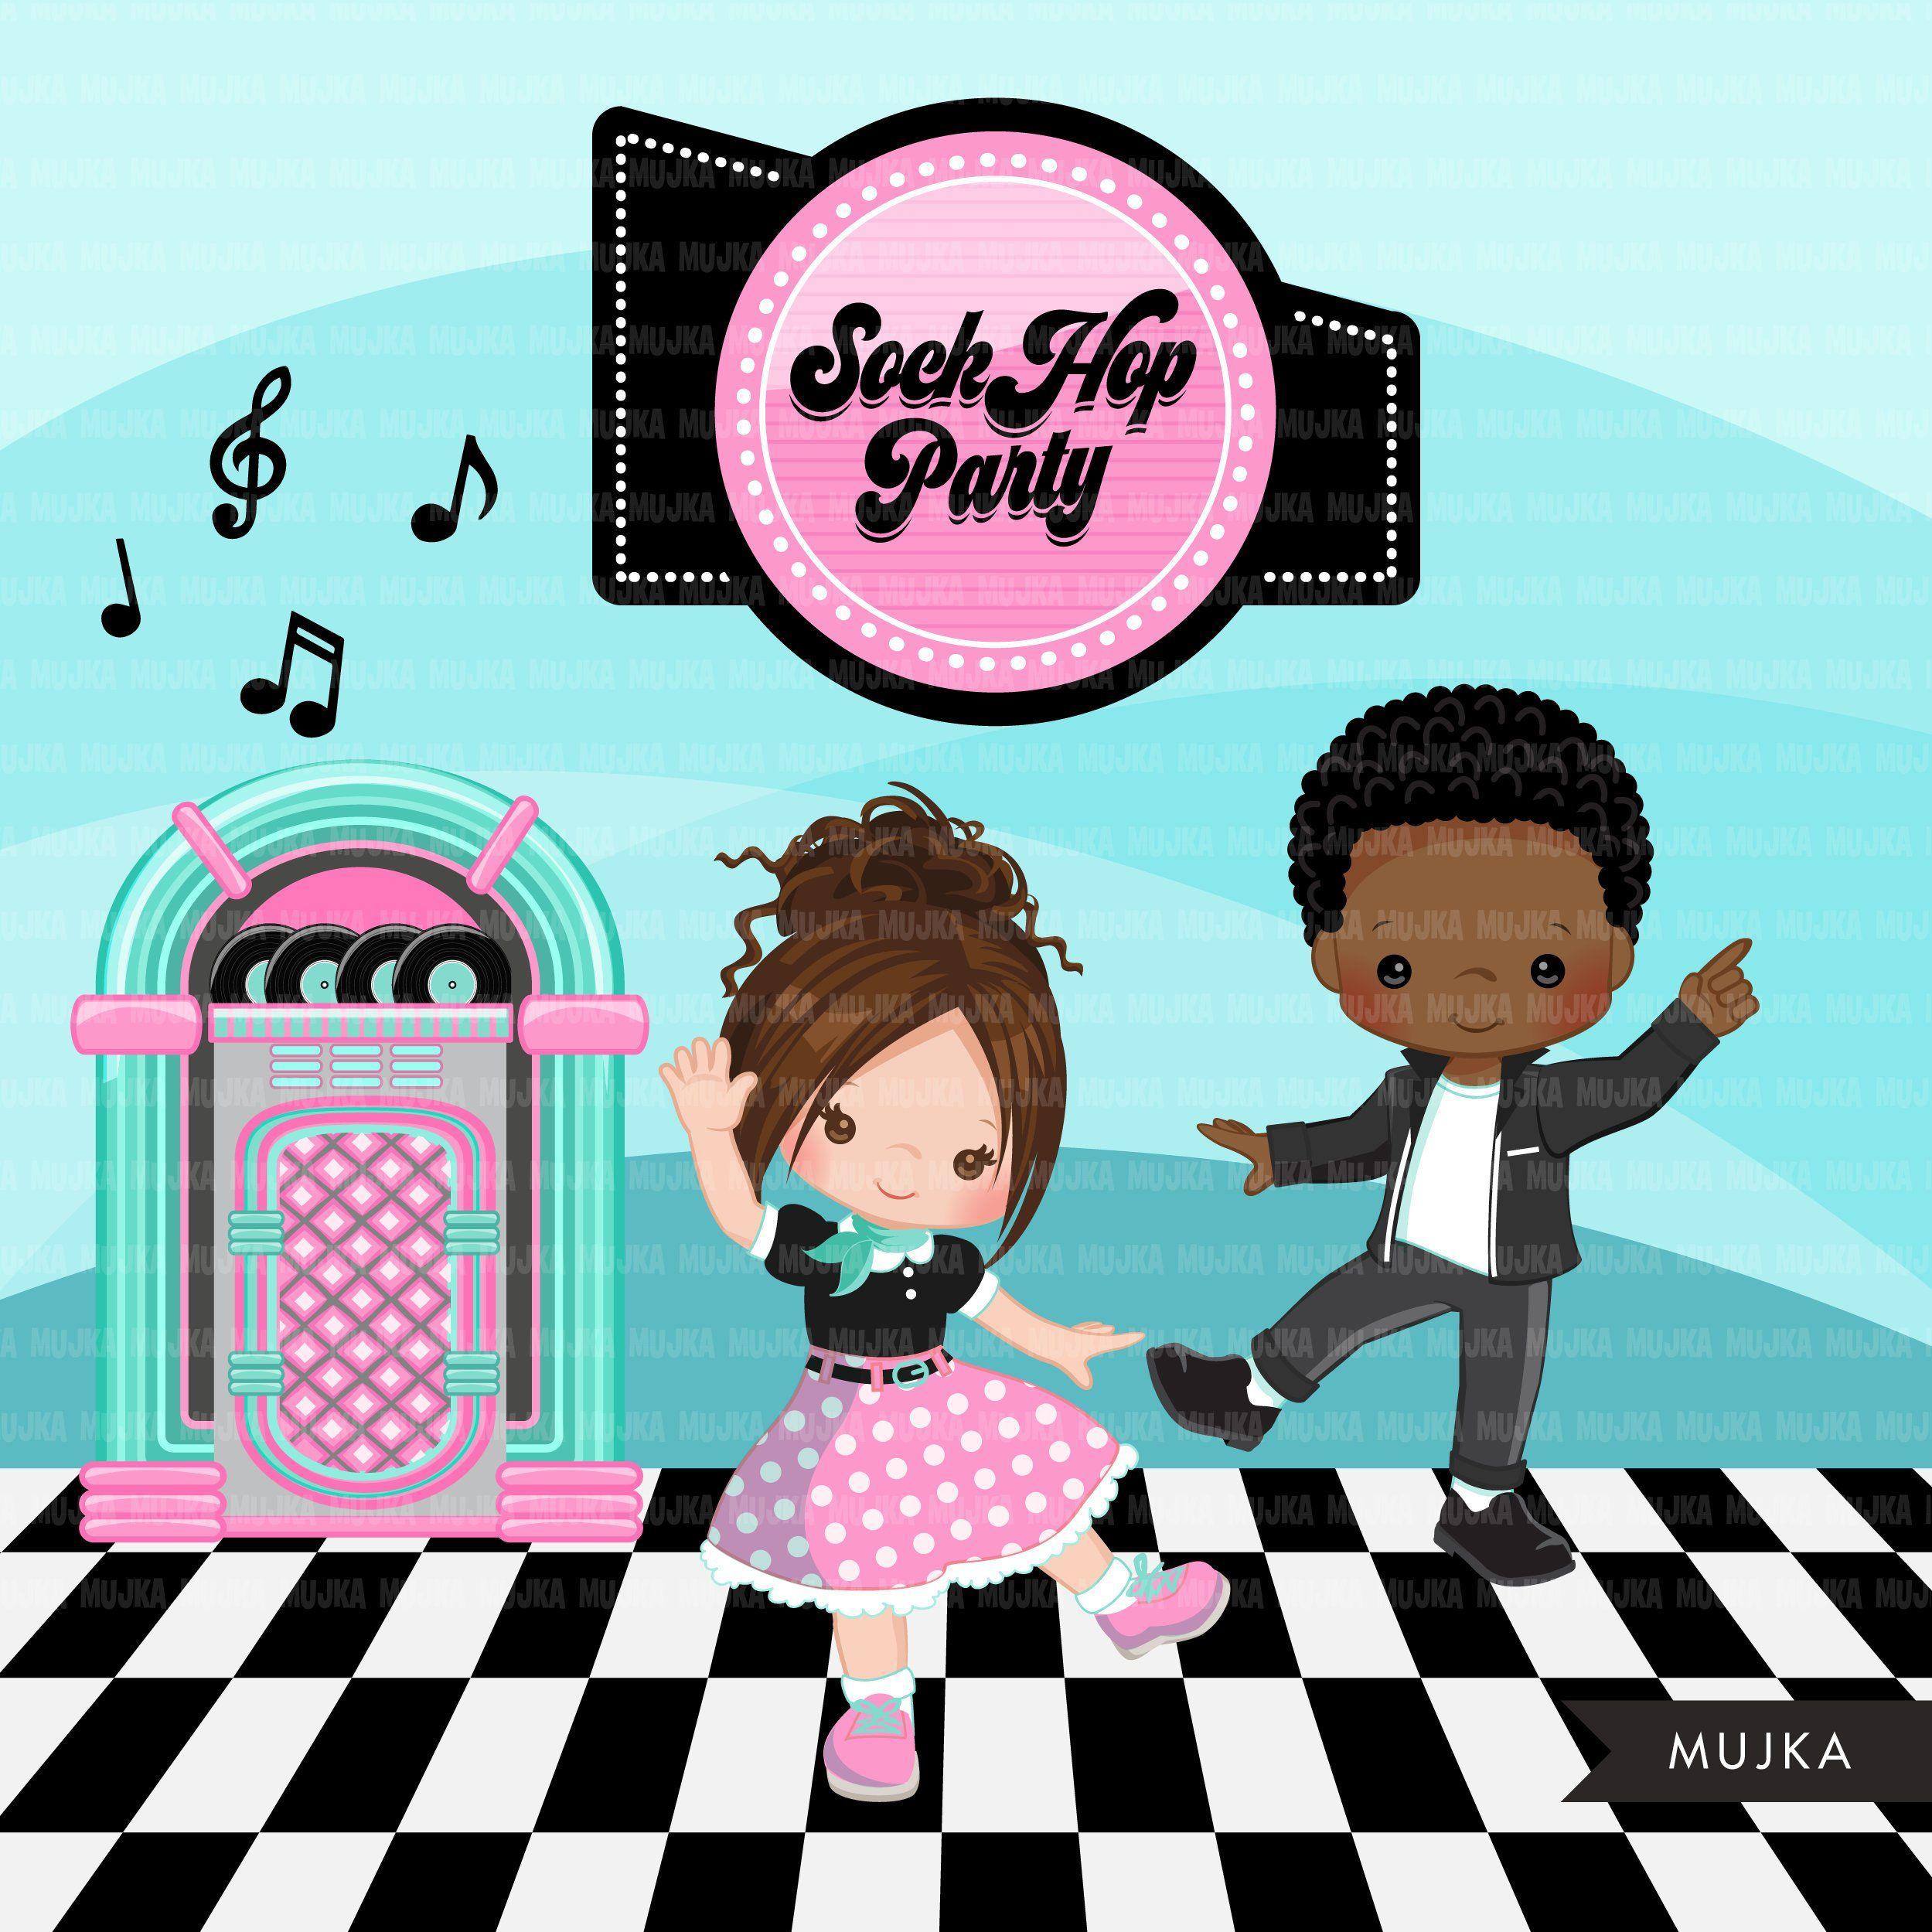 sock hop party clipart 50 s retro diner jukebox etsy [ 2499 x 2499 Pixel ]